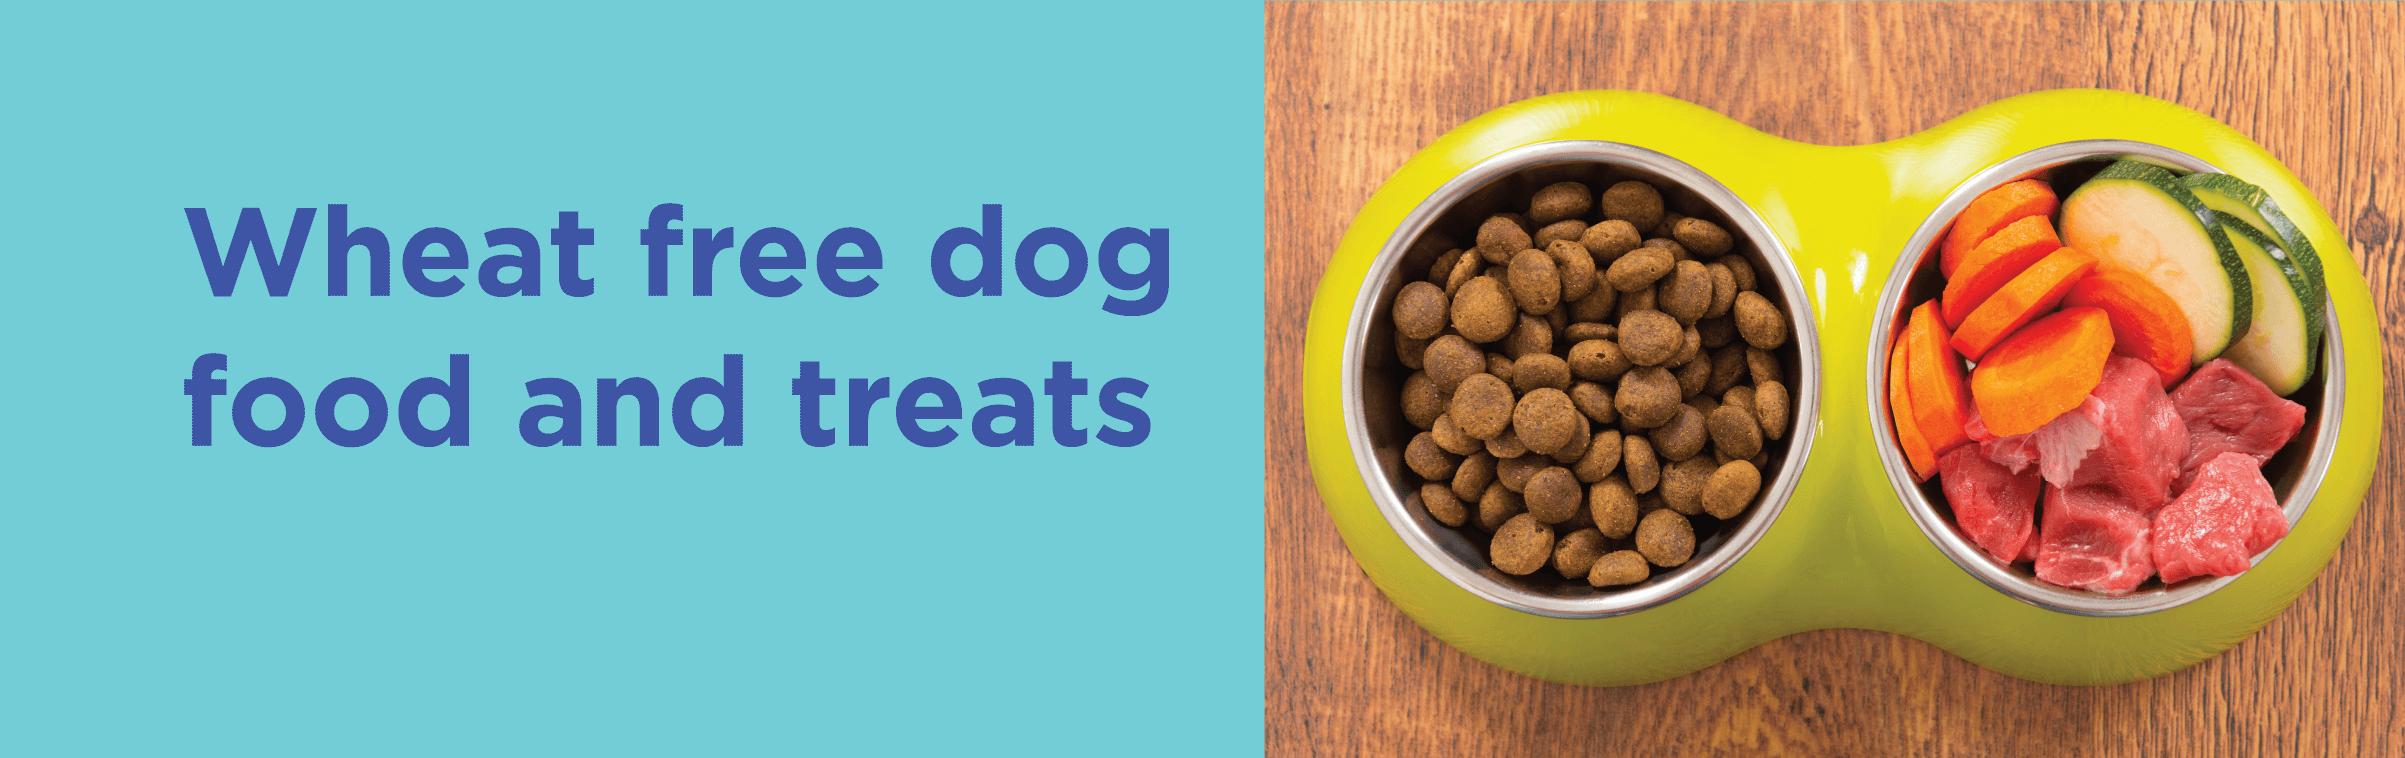 Wheat free dog food and treats